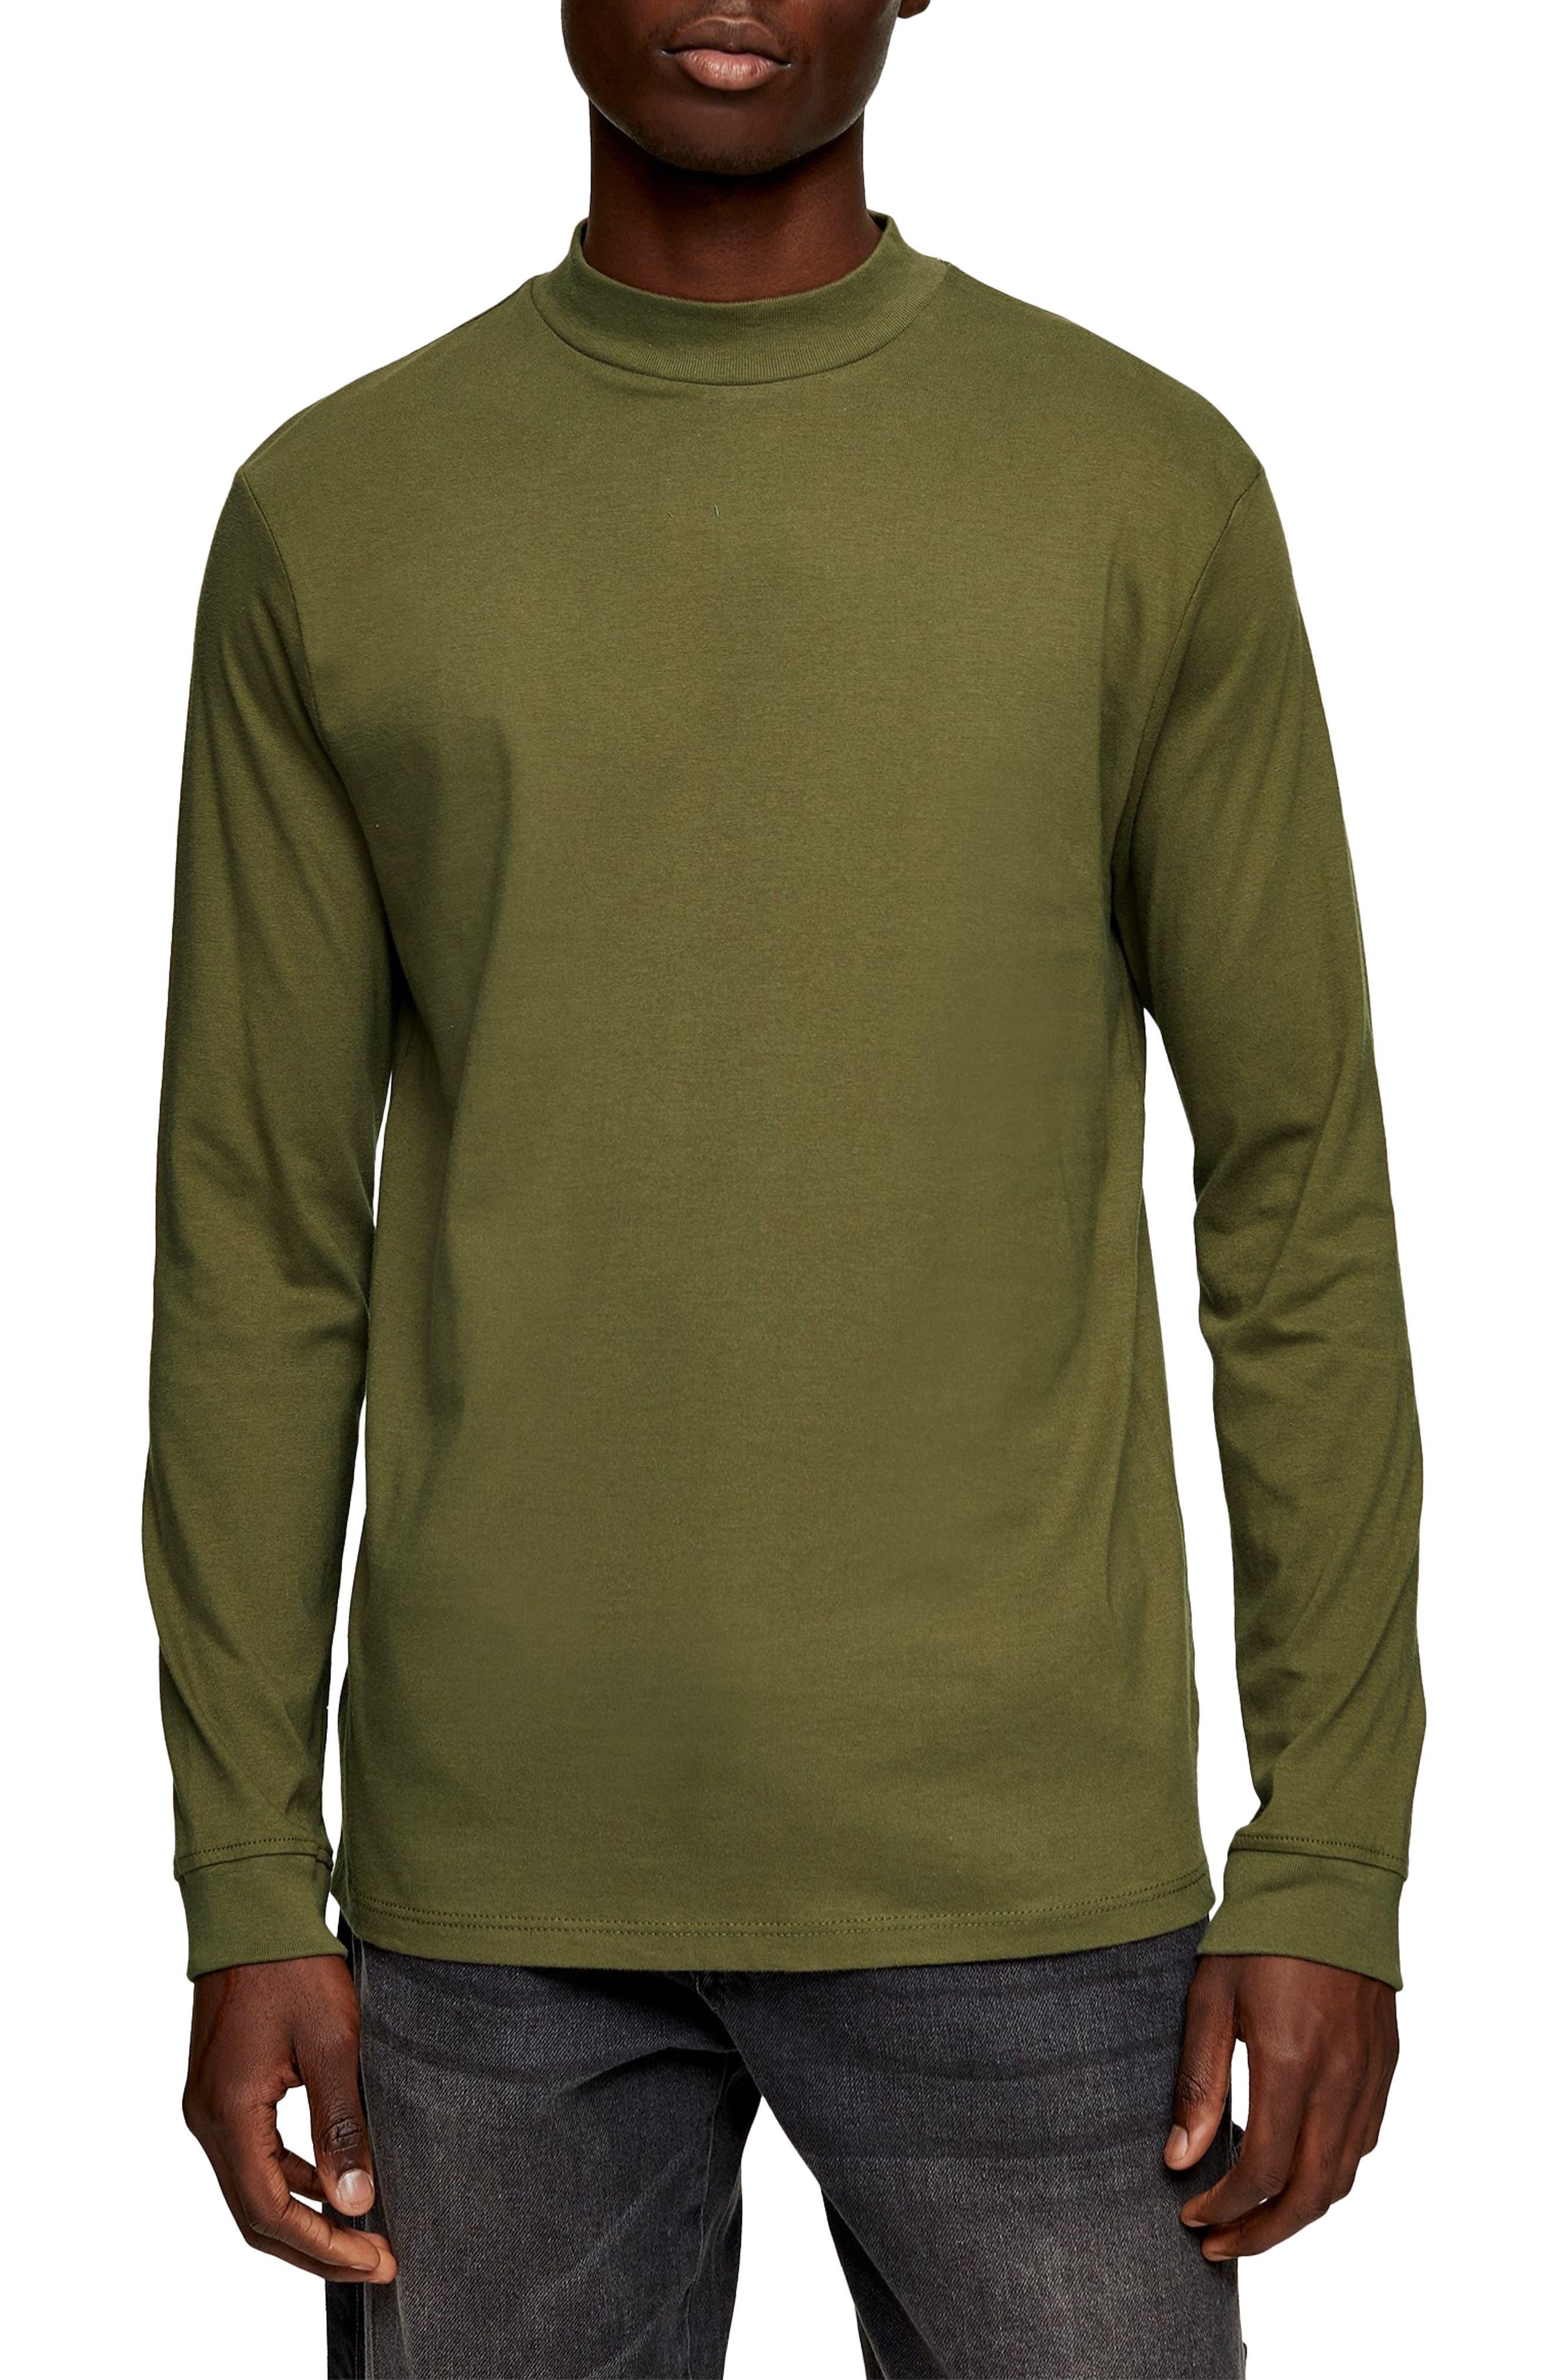 1960s Mens Shirts | 60s Mod Shirts, Hippie Shirts Mens Topman Mock Neck Long Sleeve T-Shirt Size X-Small - Green $30.00 AT vintagedancer.com